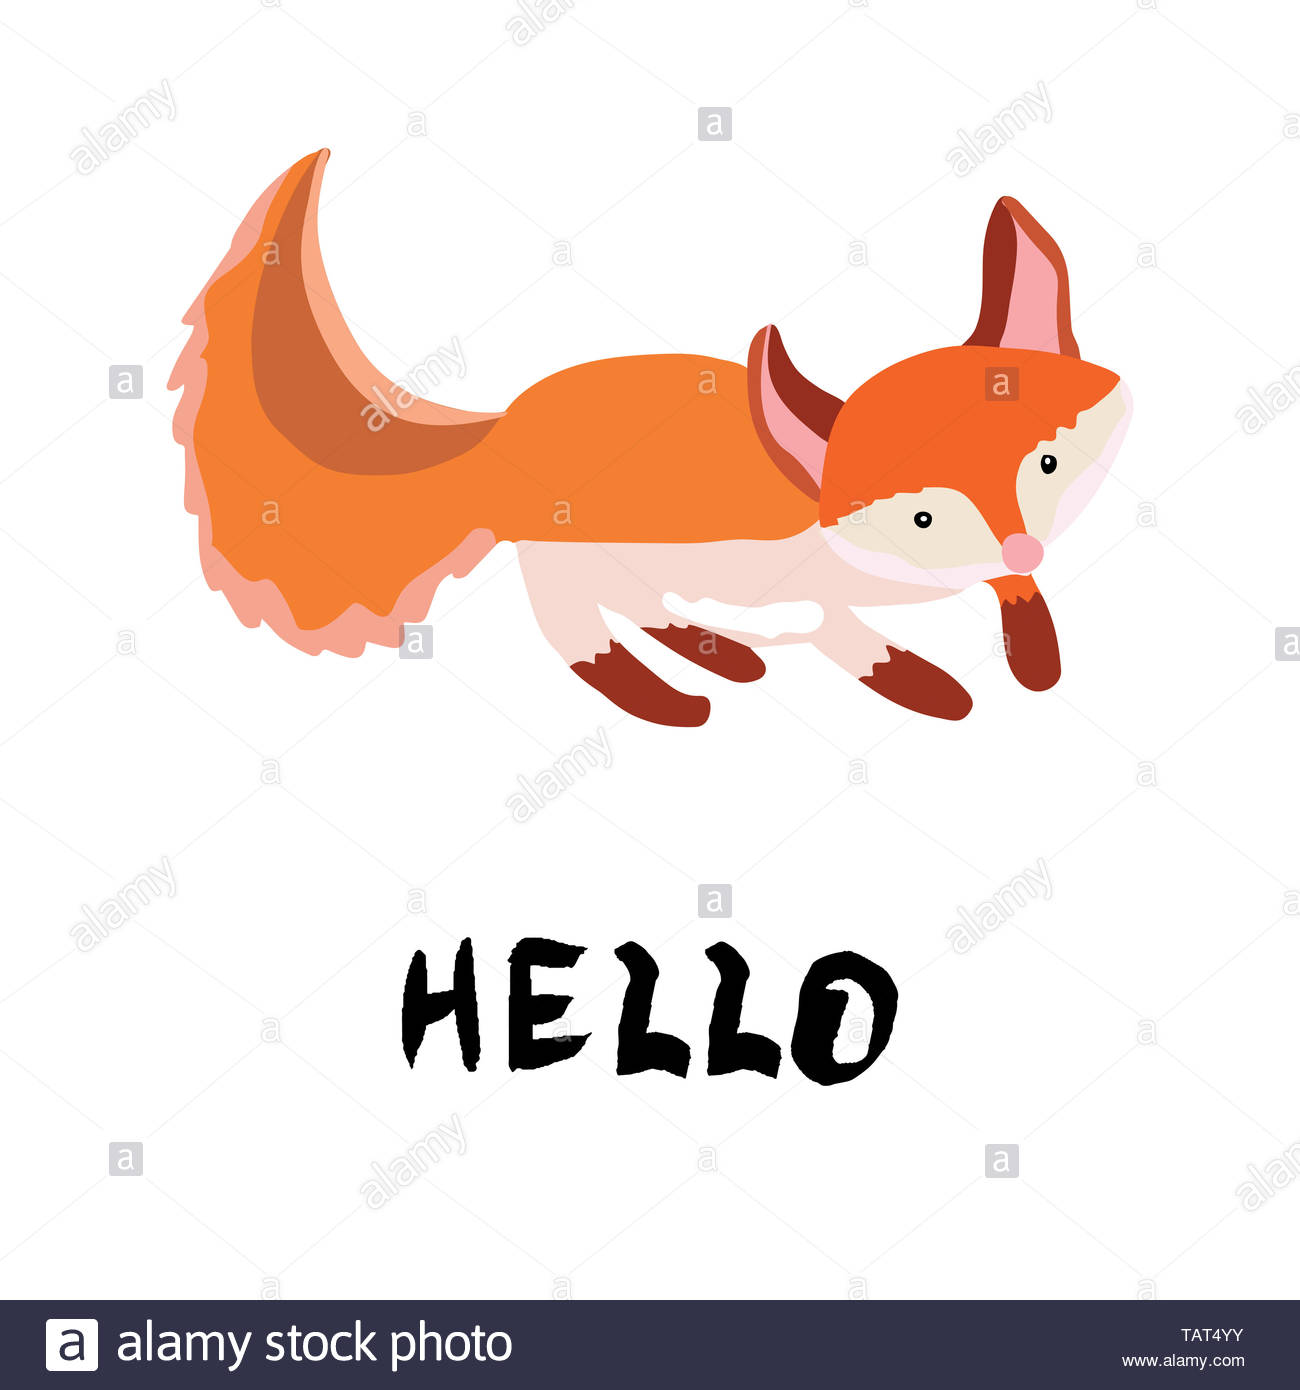 Ginger cute fox hand illustration. Hand lettering hello. White background. - Stock Image